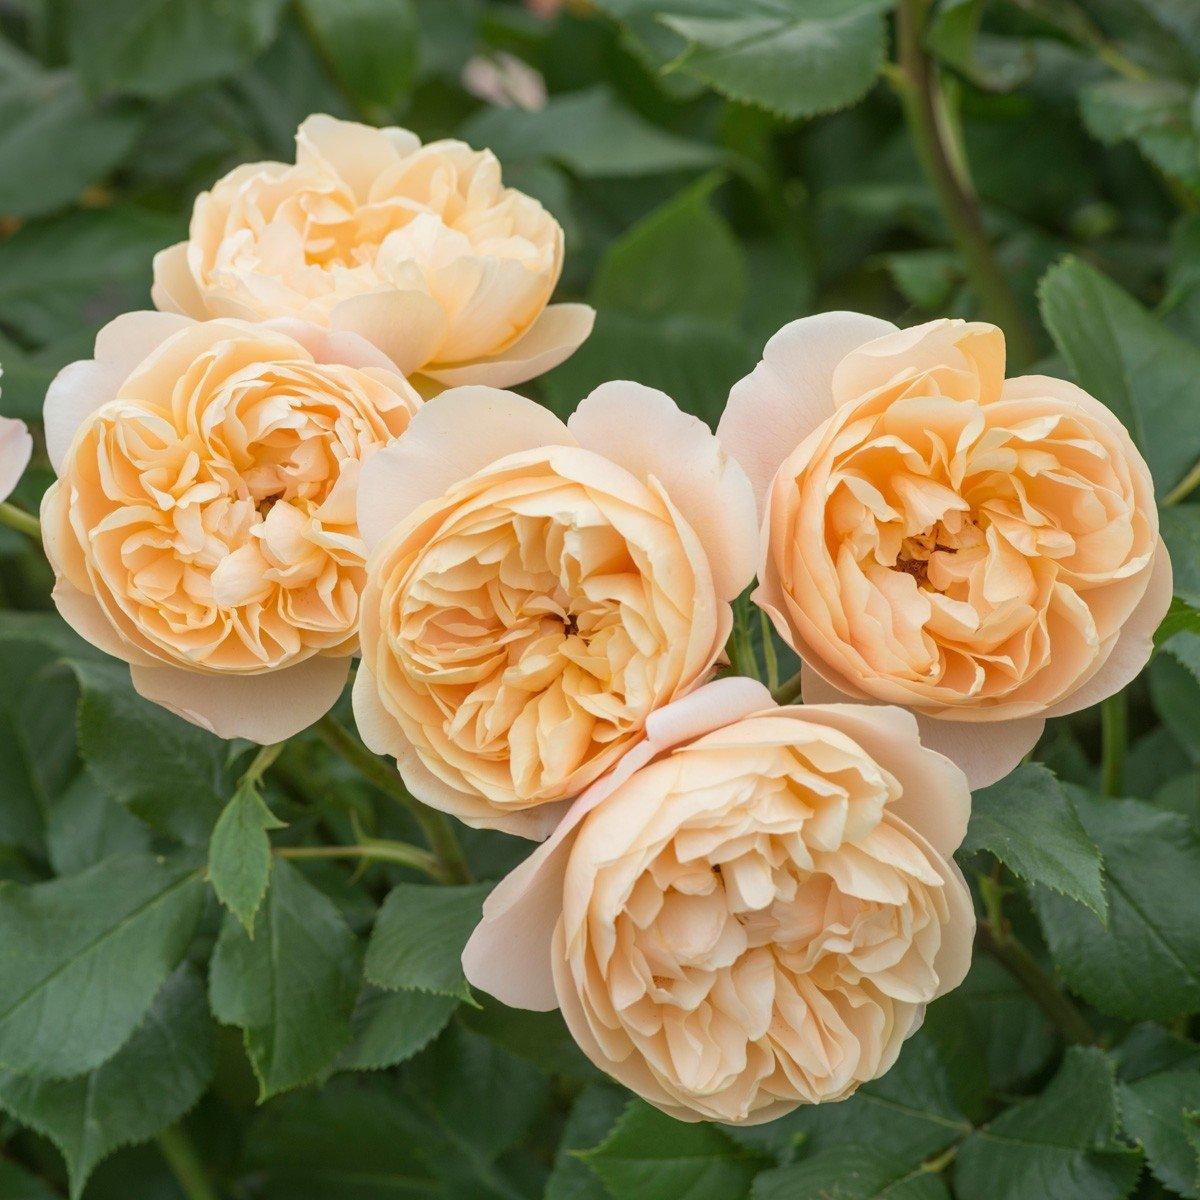 rose-roald-dahl-1